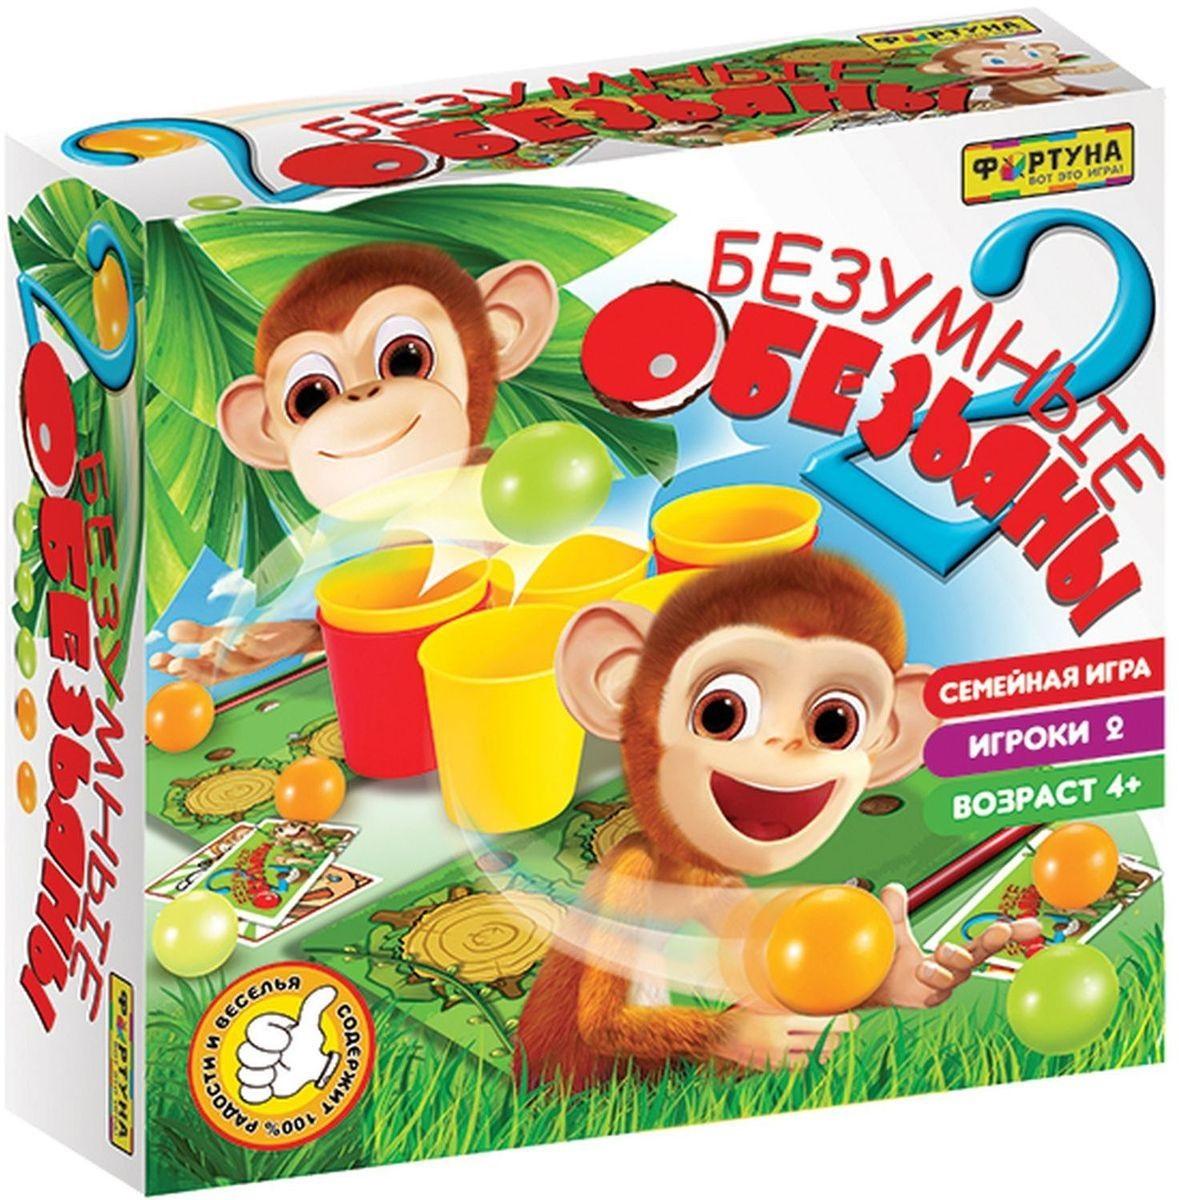 Настольная Две безумные обезьяны